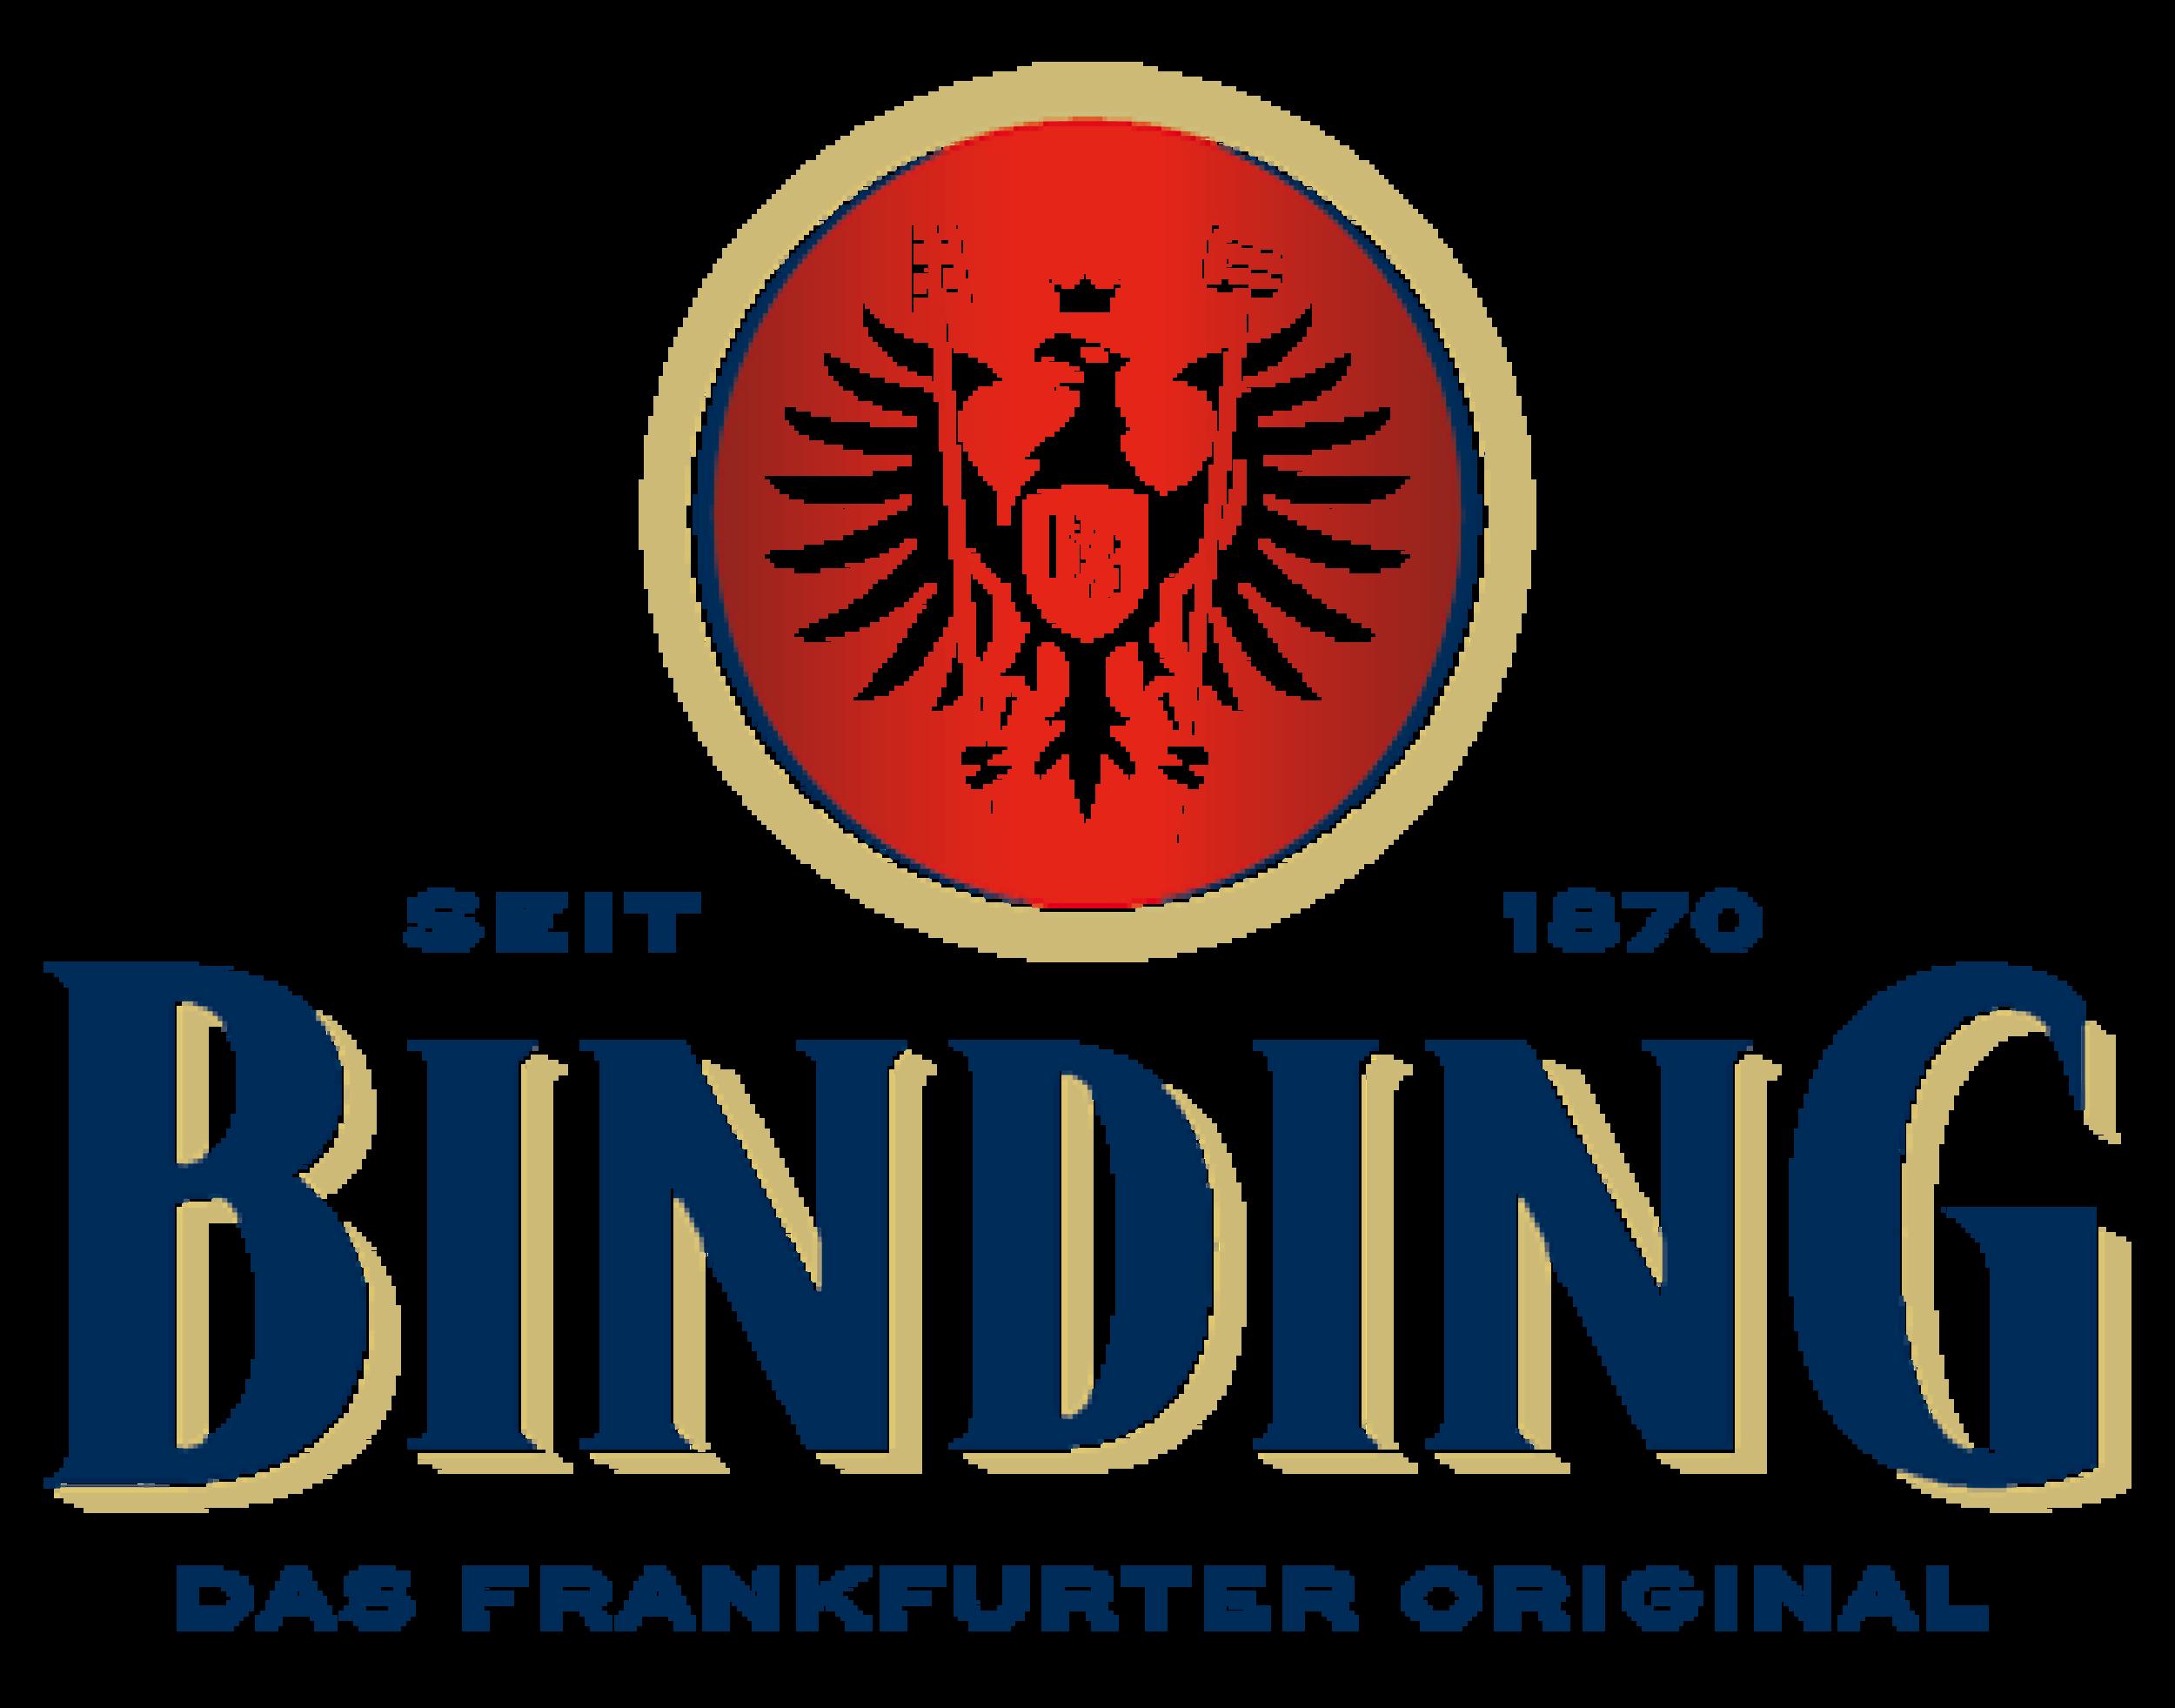 Binding logo. Links to Binding website.